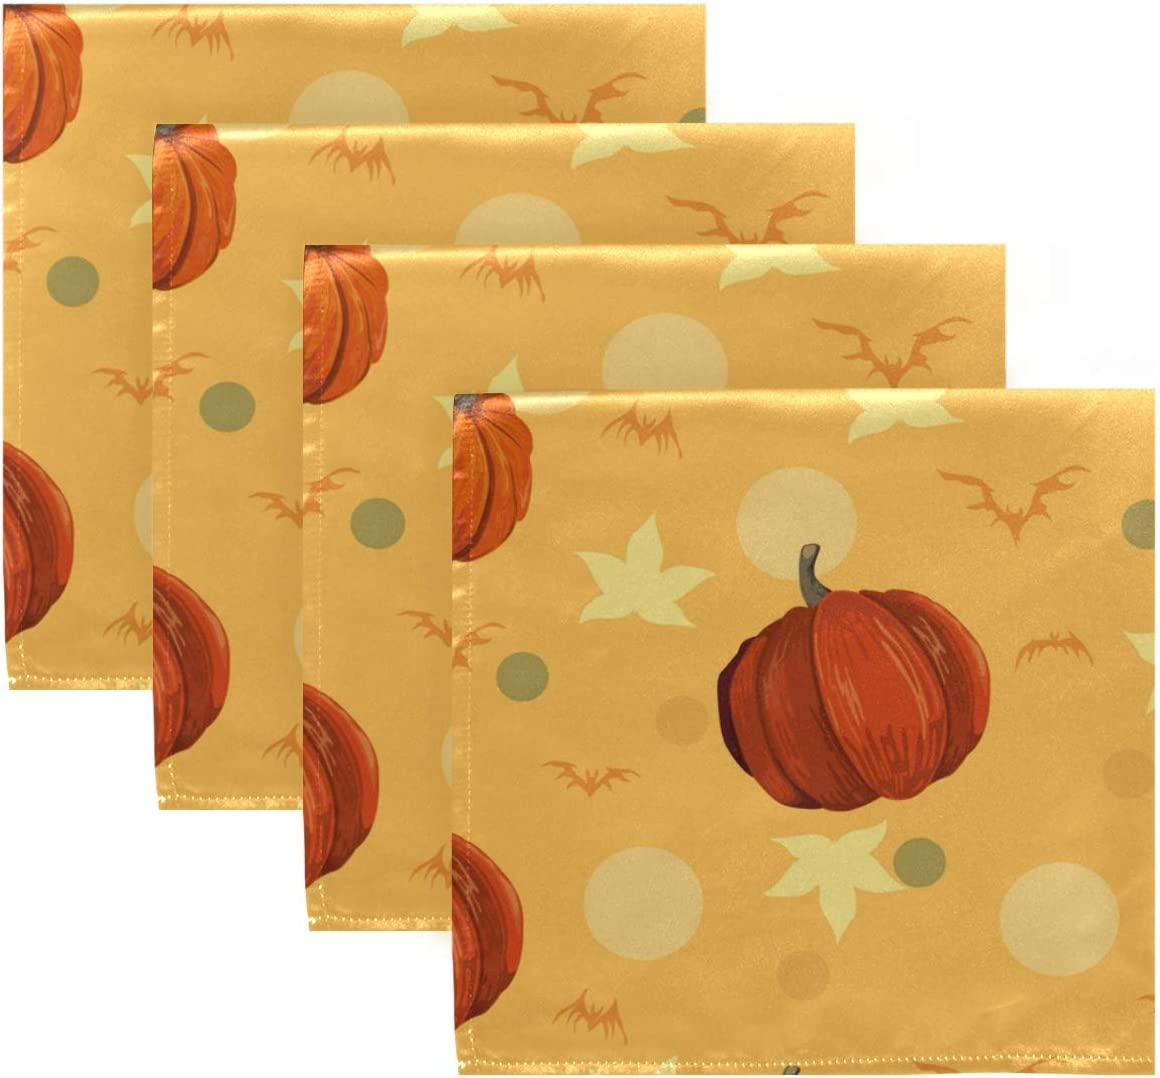 UMIRIKO Ranking integrated 1st place Happy Halloween Bombing new work Pumpkin Cloth Washable Napkin Di Machine